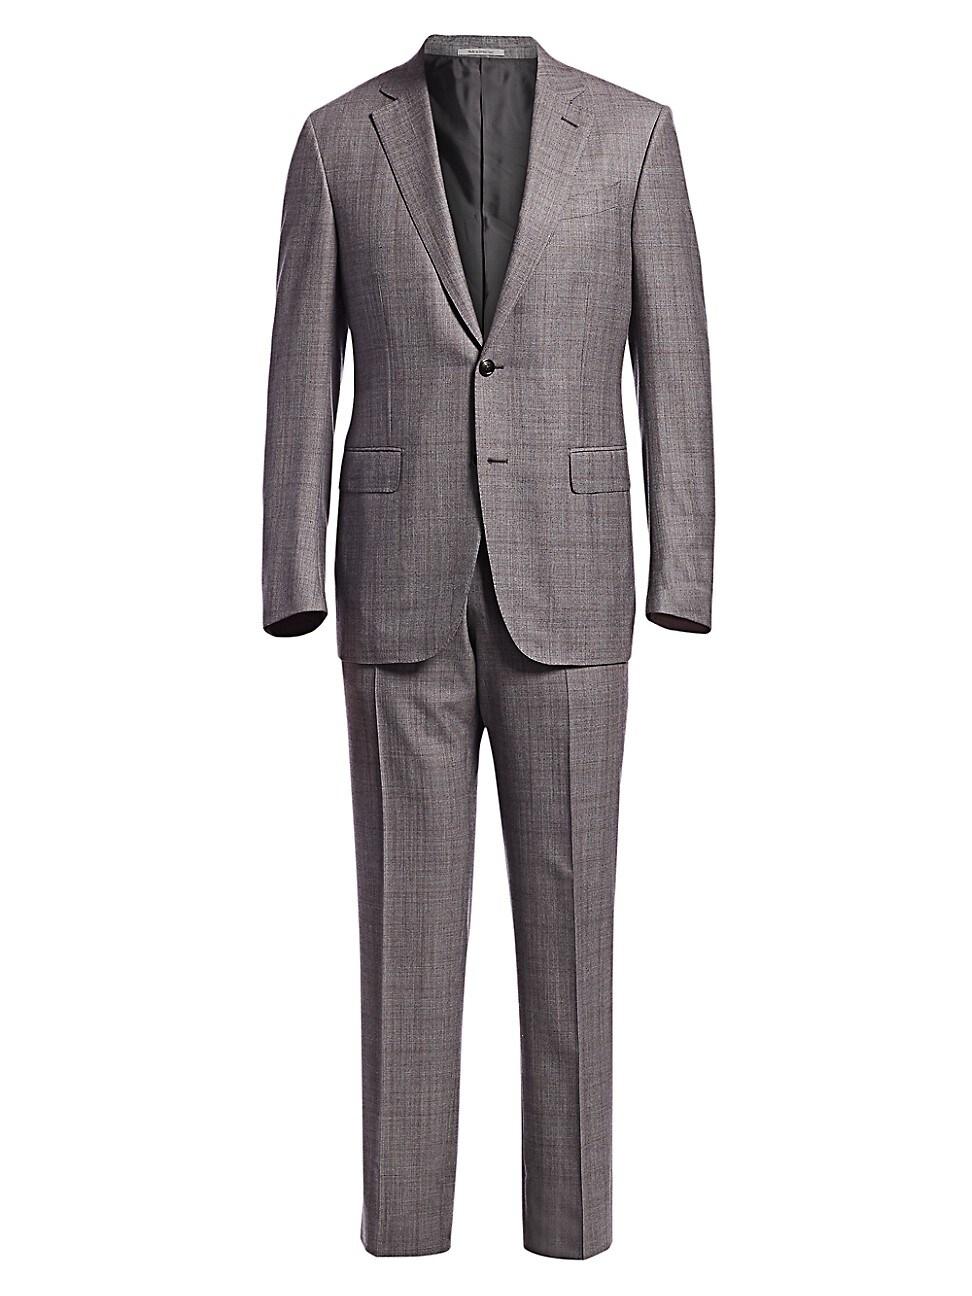 Ermenegildo Zegna Men's Two-button Wool Plaid Suit In Grey